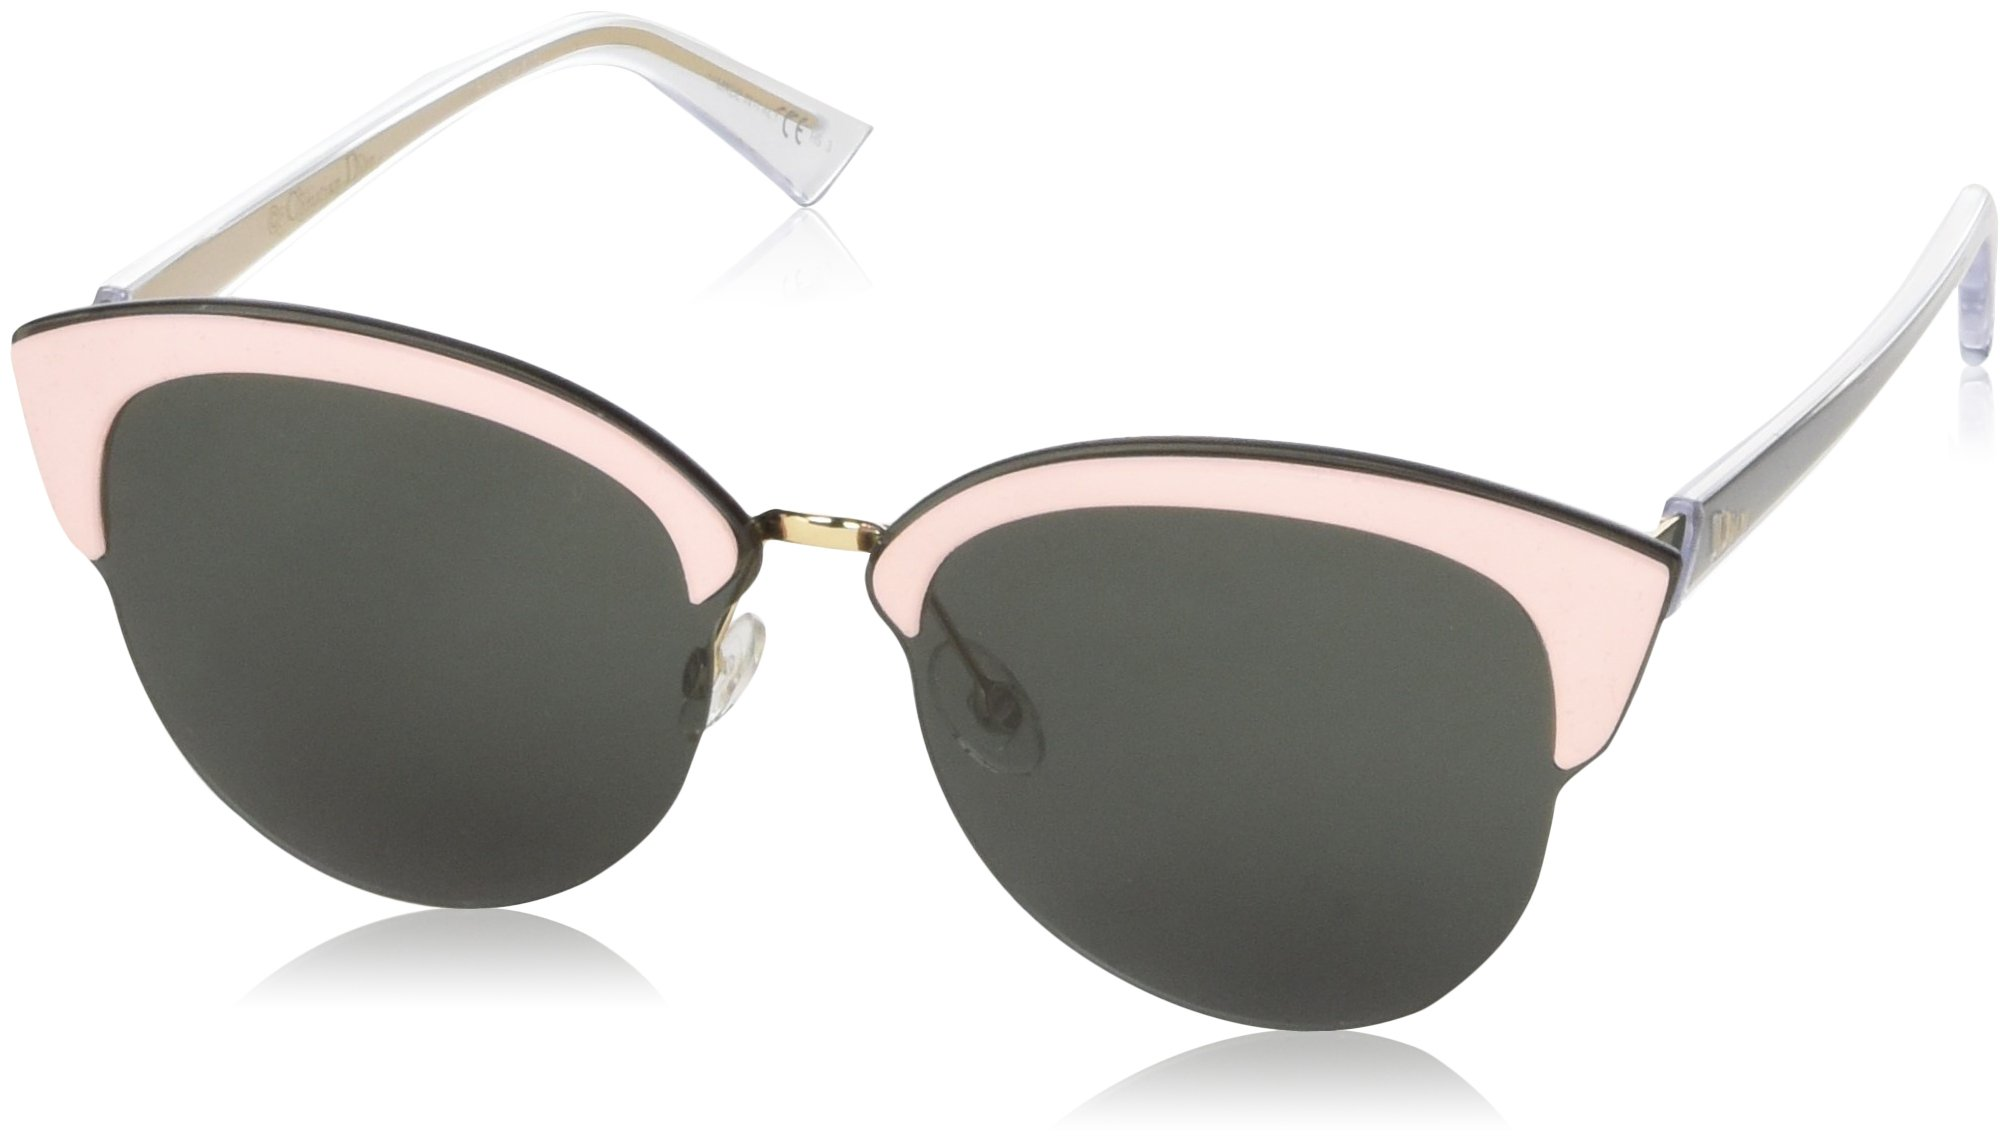 Christian Qt De Gold Dior Diorun Bkl Montures GreenFemme 65 LunettesOrrose Pink sQdCohxtrB